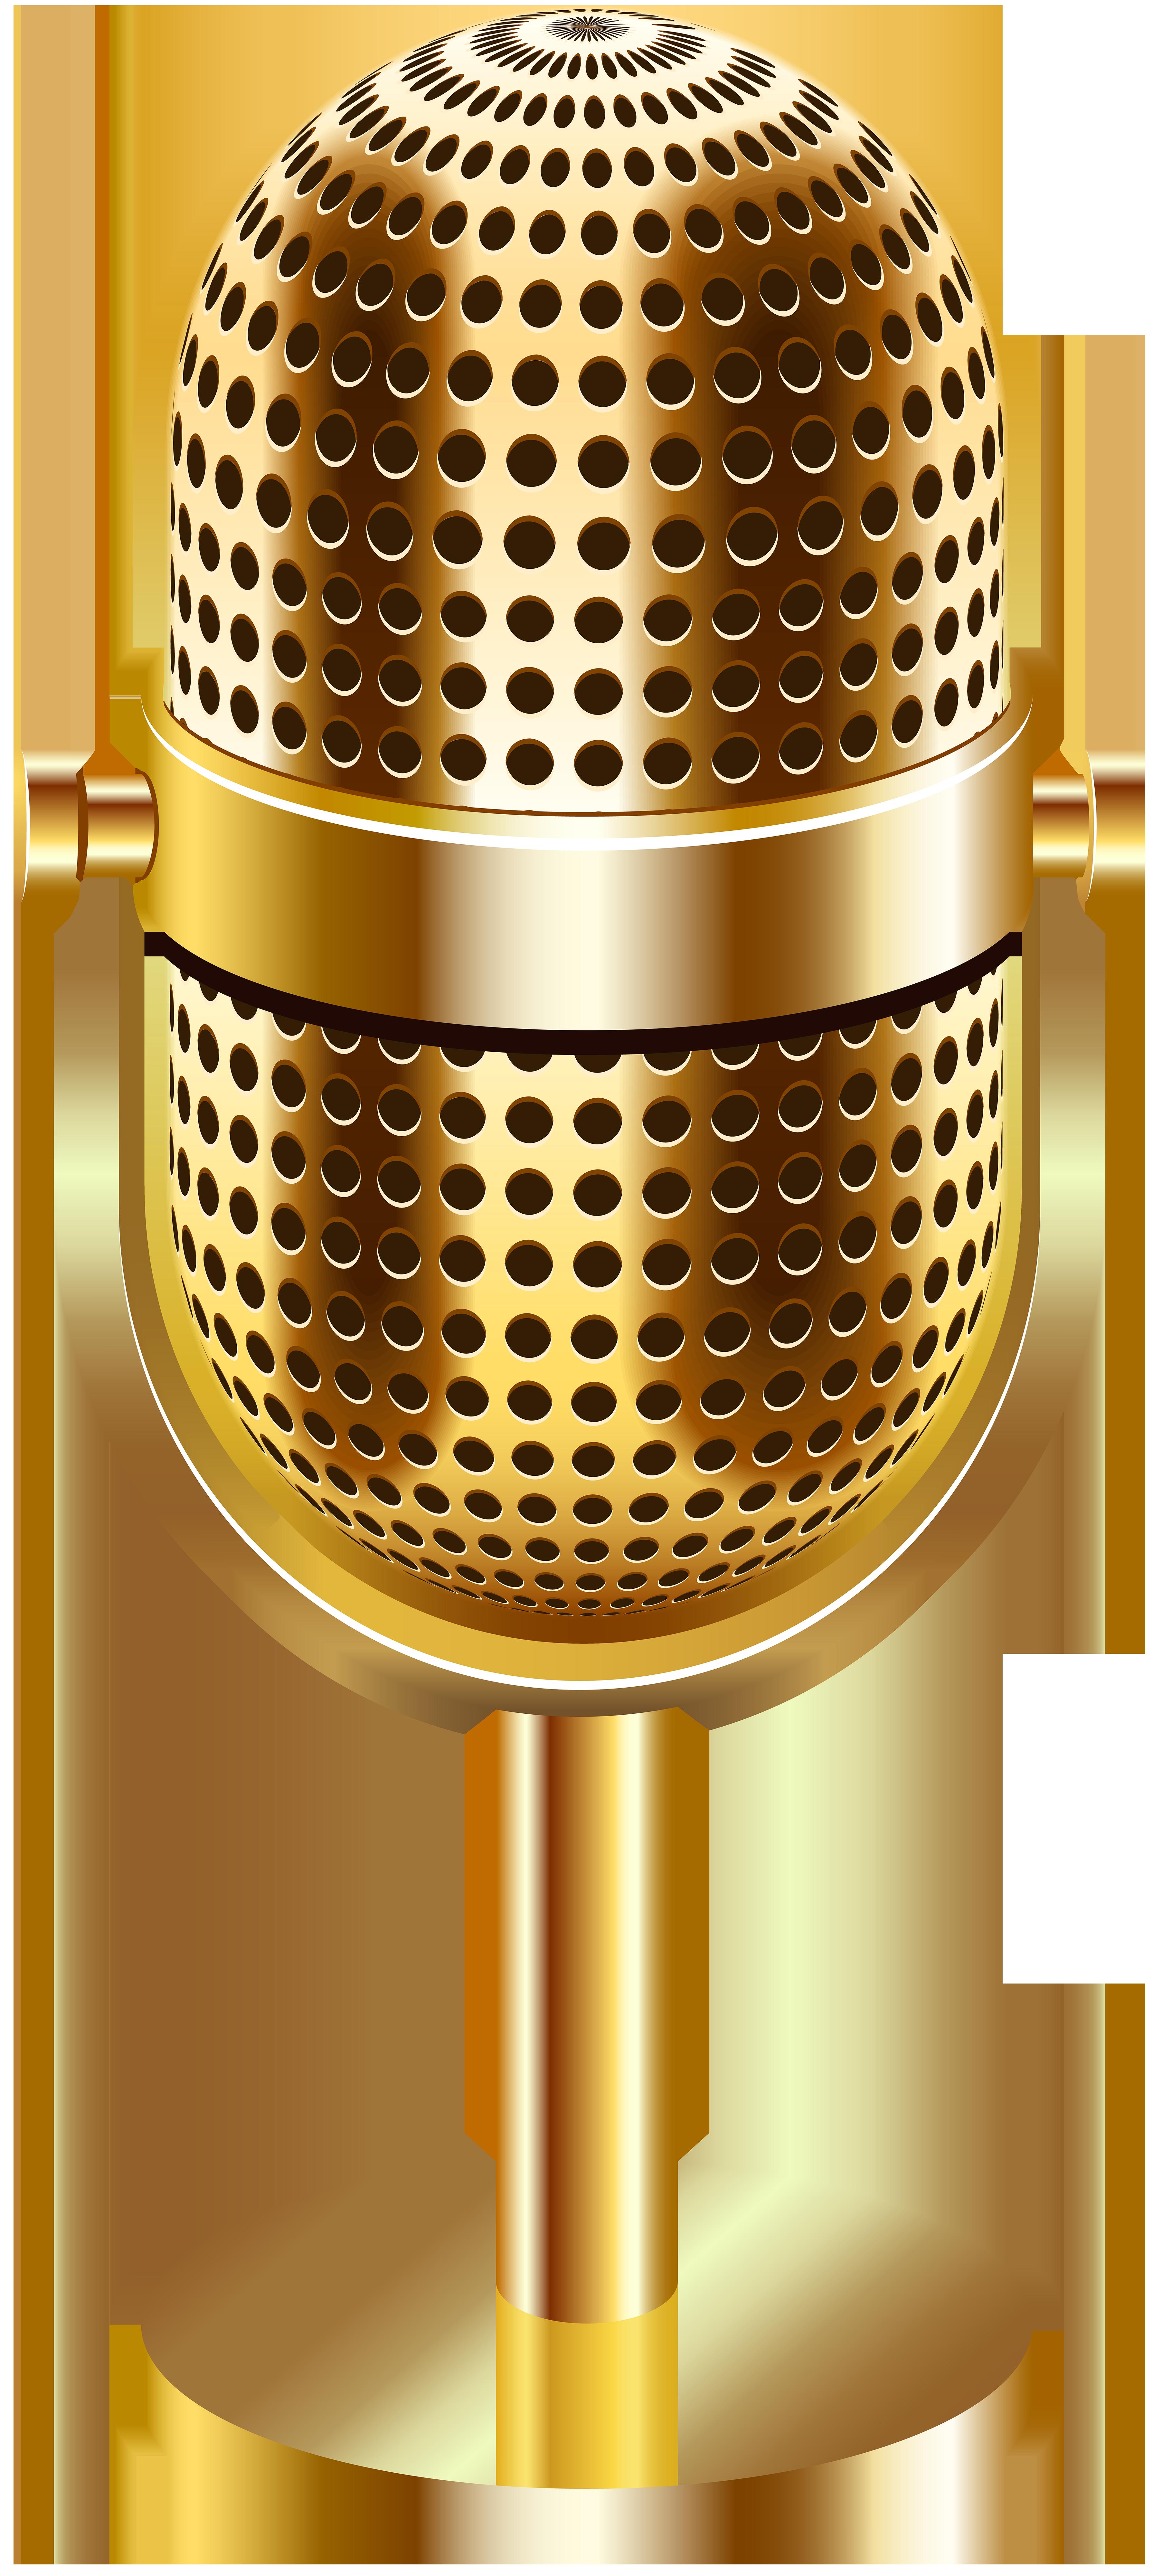 Vintage Microphone Gold Transparent Clip Art Image.